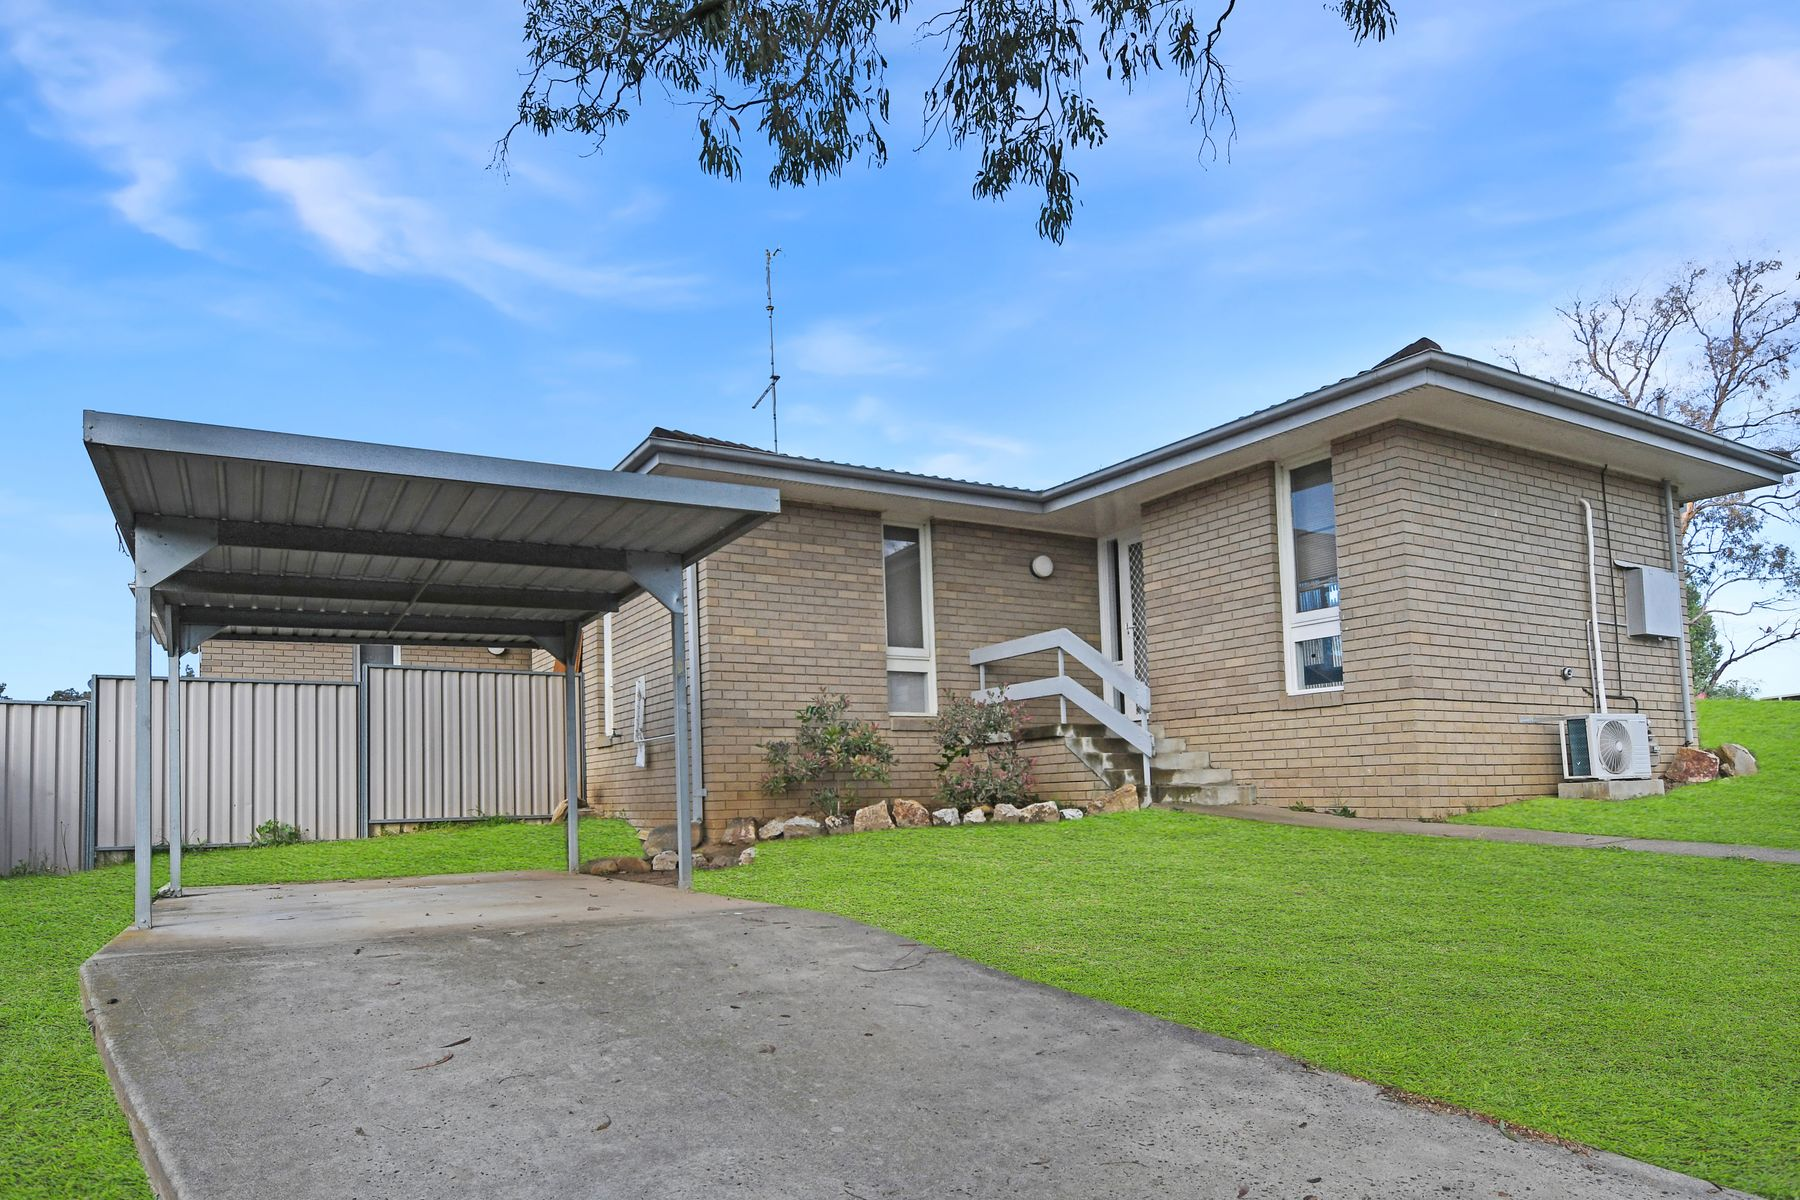 44 Havenhand Way, Mitchell, NSW 2795